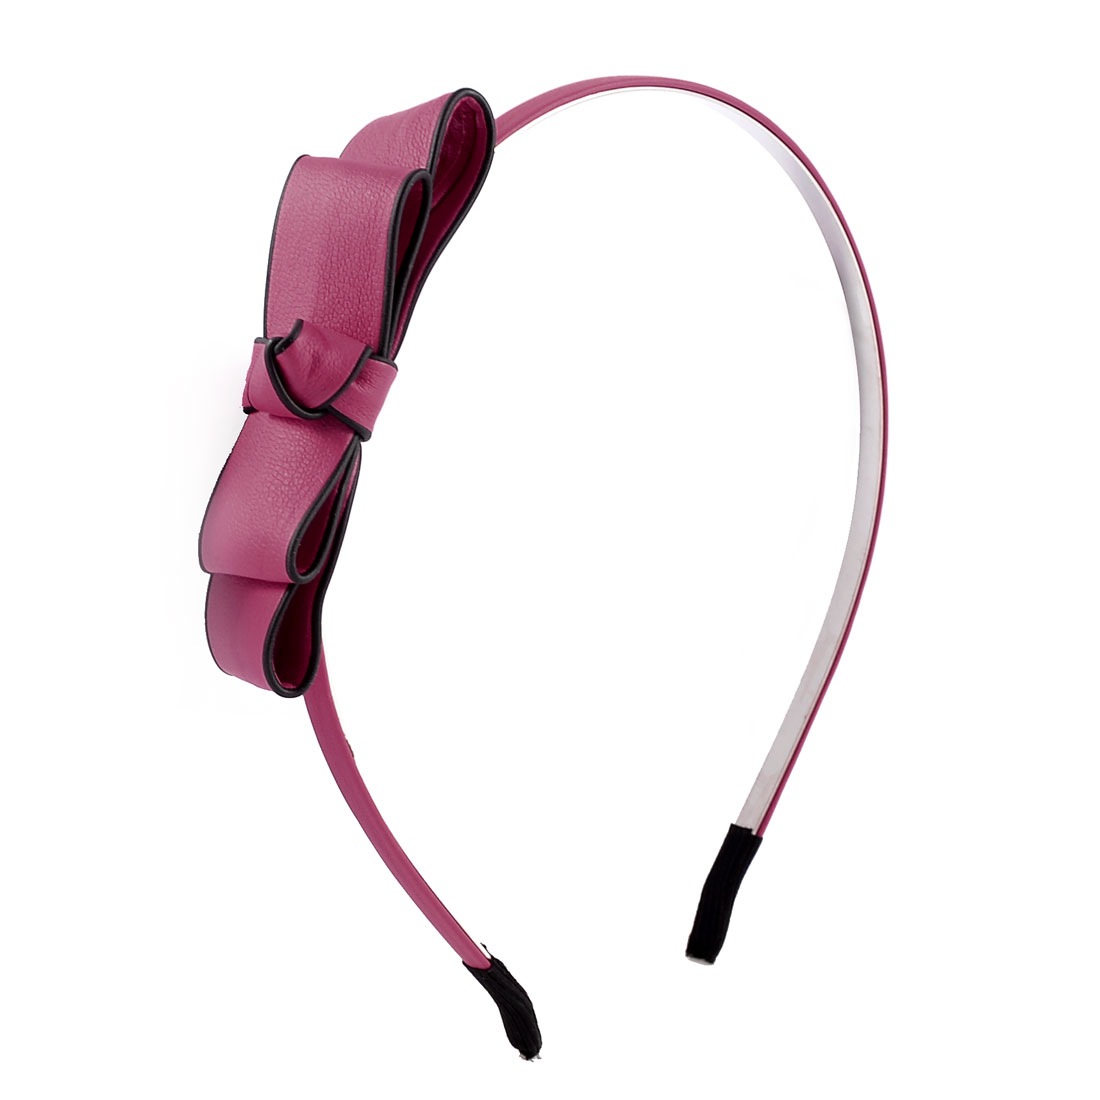 Faux Leather Bowknot Decor Metallic Frame Headband Hair Hoop Fuchsia